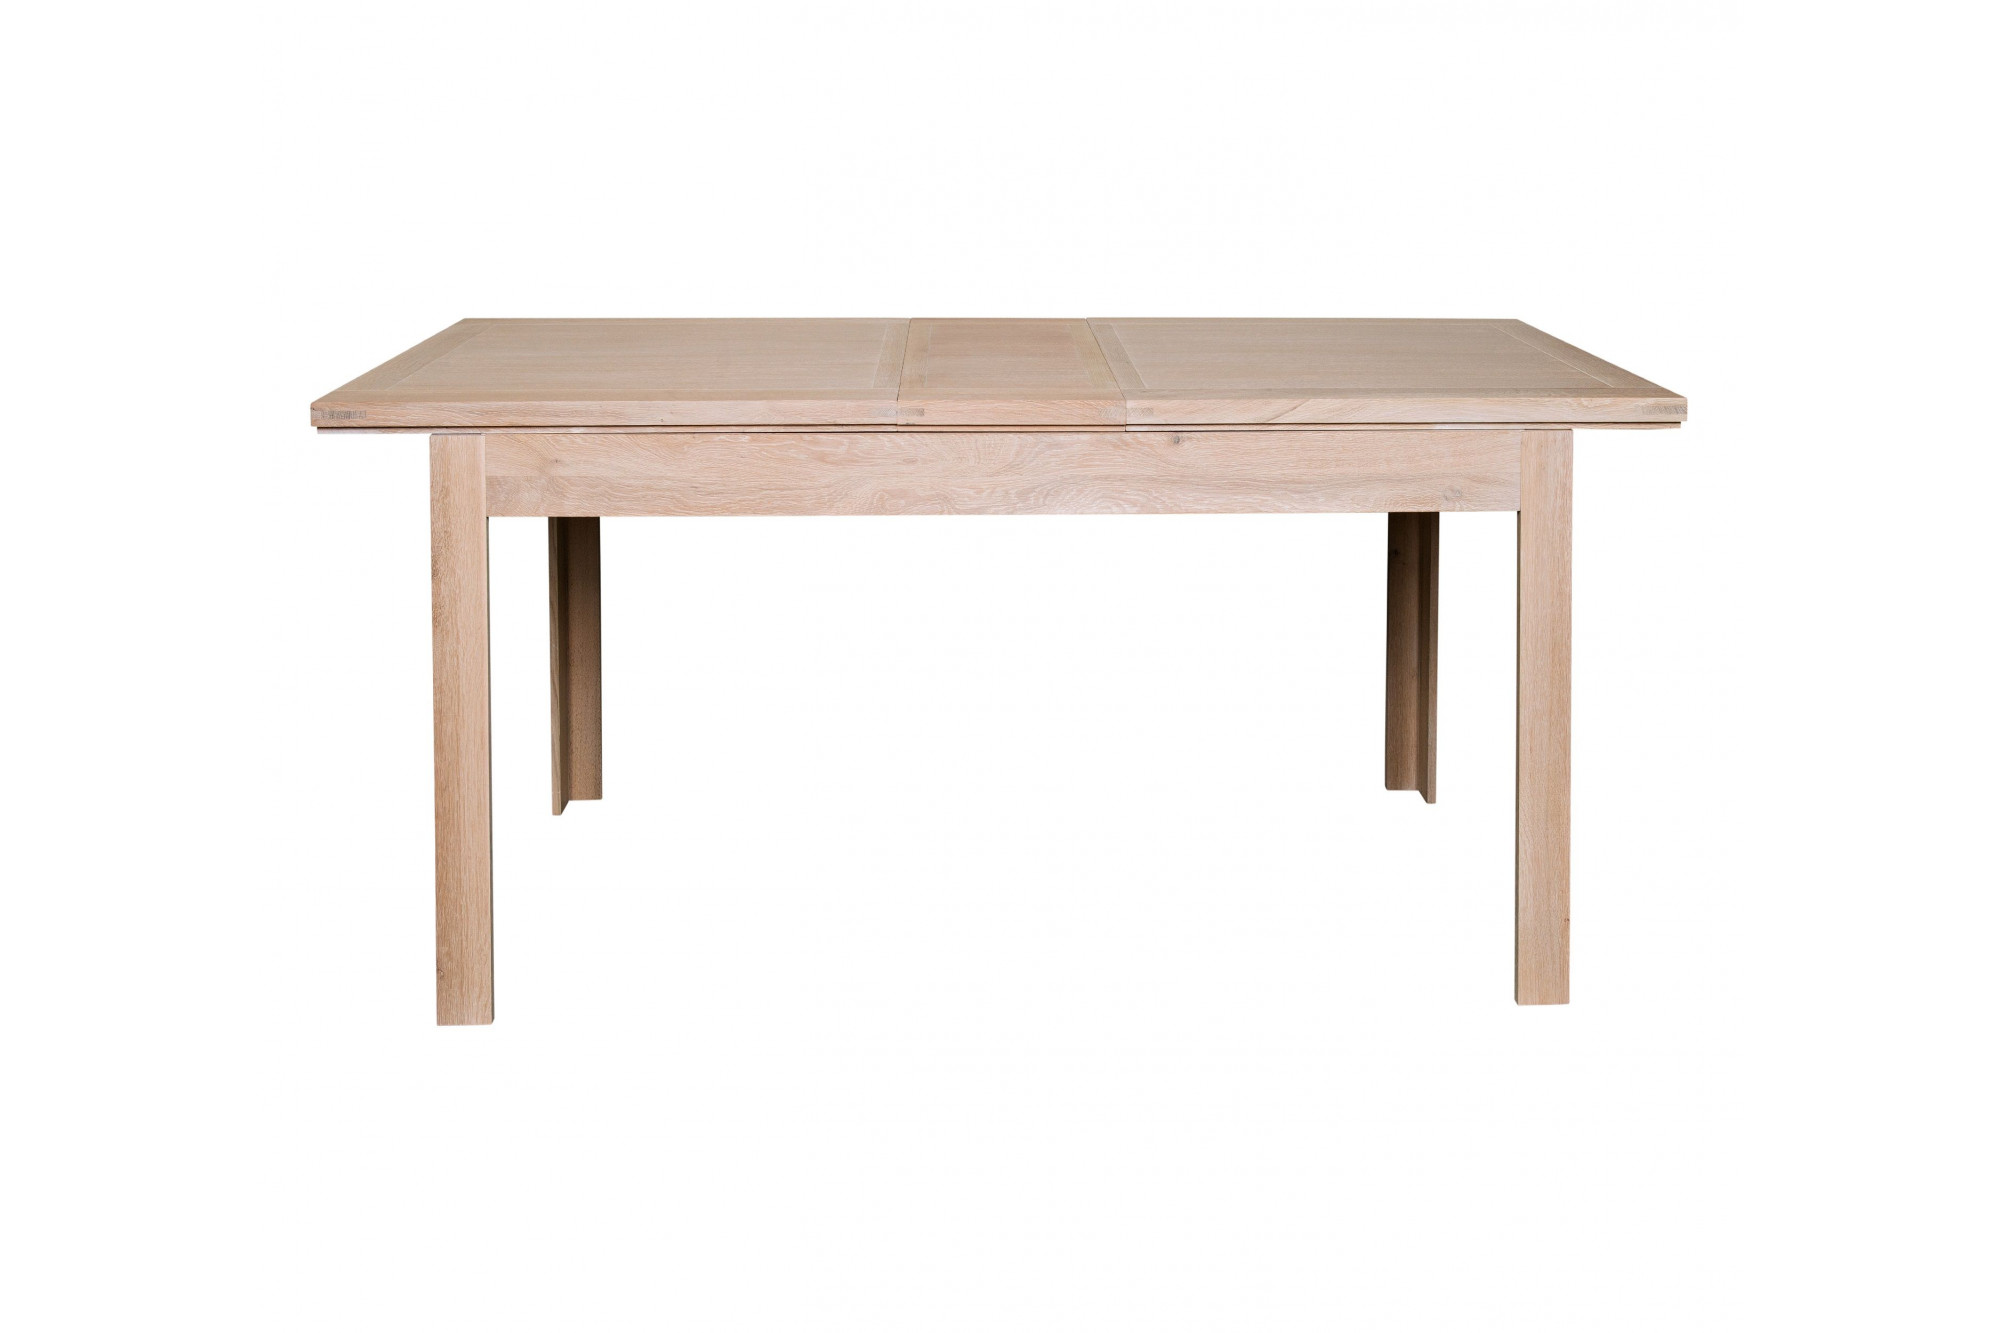 table manger carr e avec rallonges en ch ne ch ne. Black Bedroom Furniture Sets. Home Design Ideas